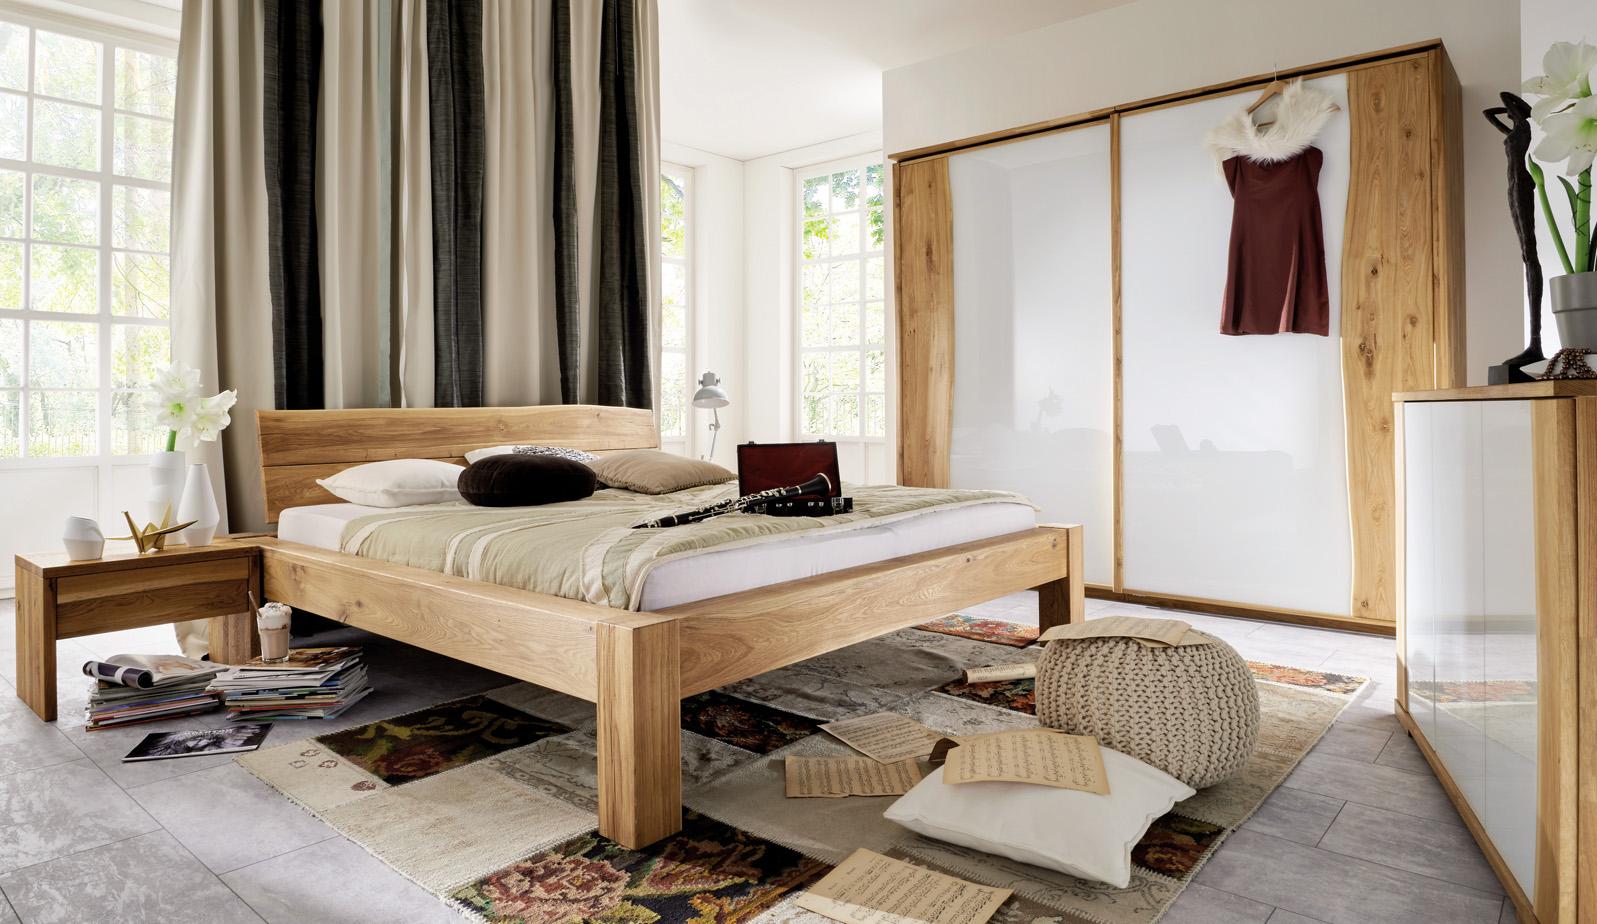 Full Size of Schlafzimmer Massivholz Dansk Design Massivholzmbel Mit überbau Komplett Poco Set Günstig Stuhl Günstige Guenstig Teppich Eckschrank Deckenleuchten Schrank Schlafzimmer Schlafzimmer Massivholz